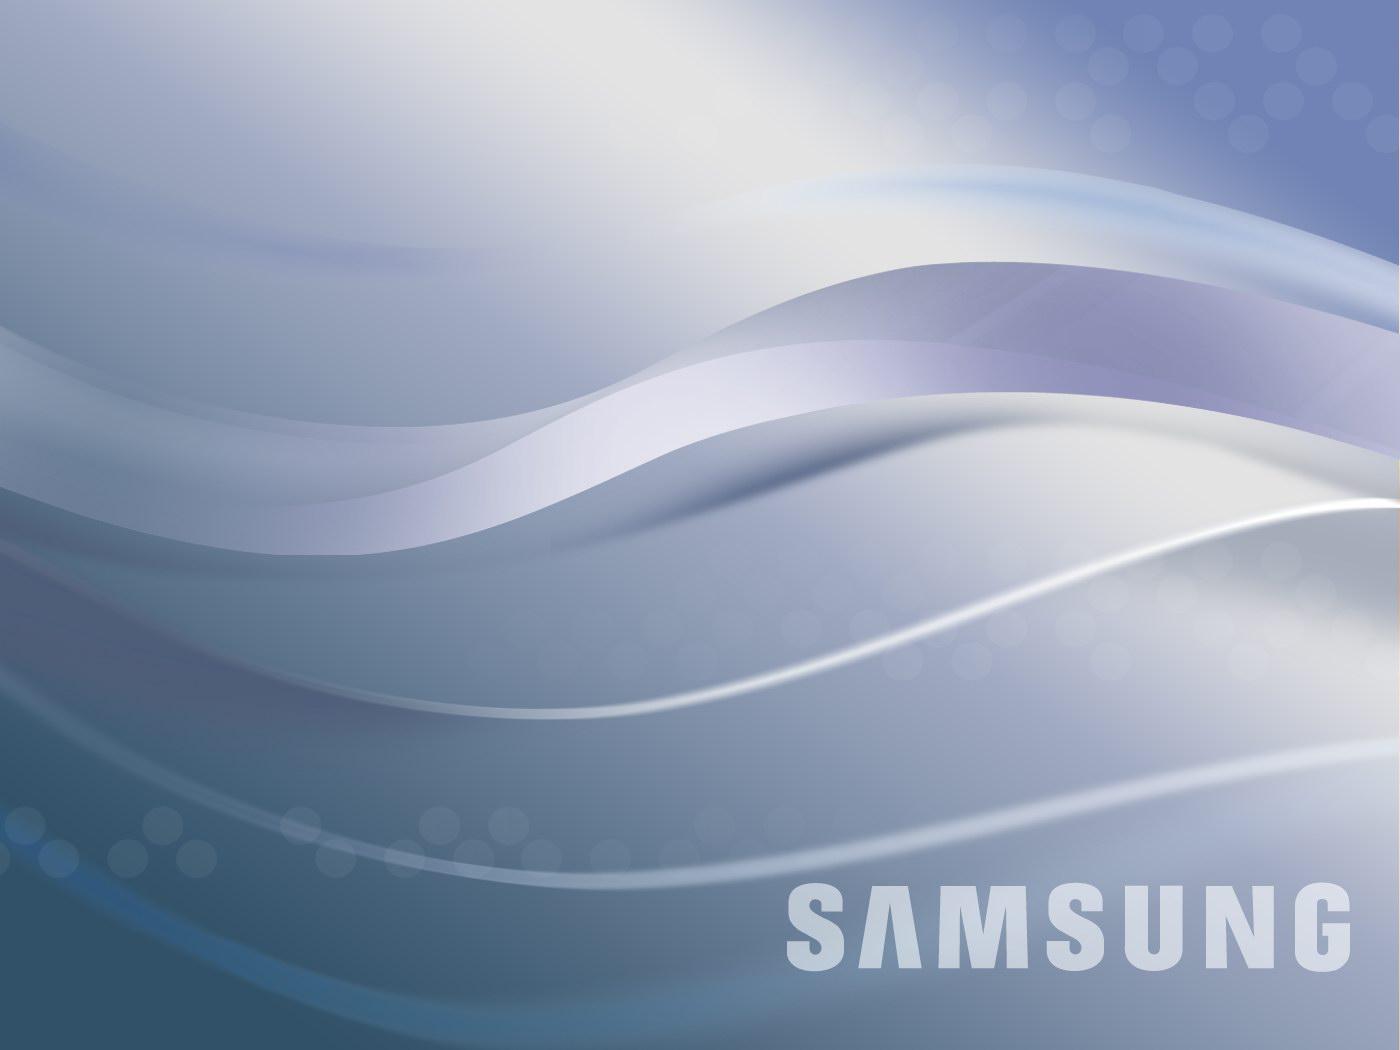 Samsung Hd Wallpapers: Samsung E2252 Wallpaper Free Download